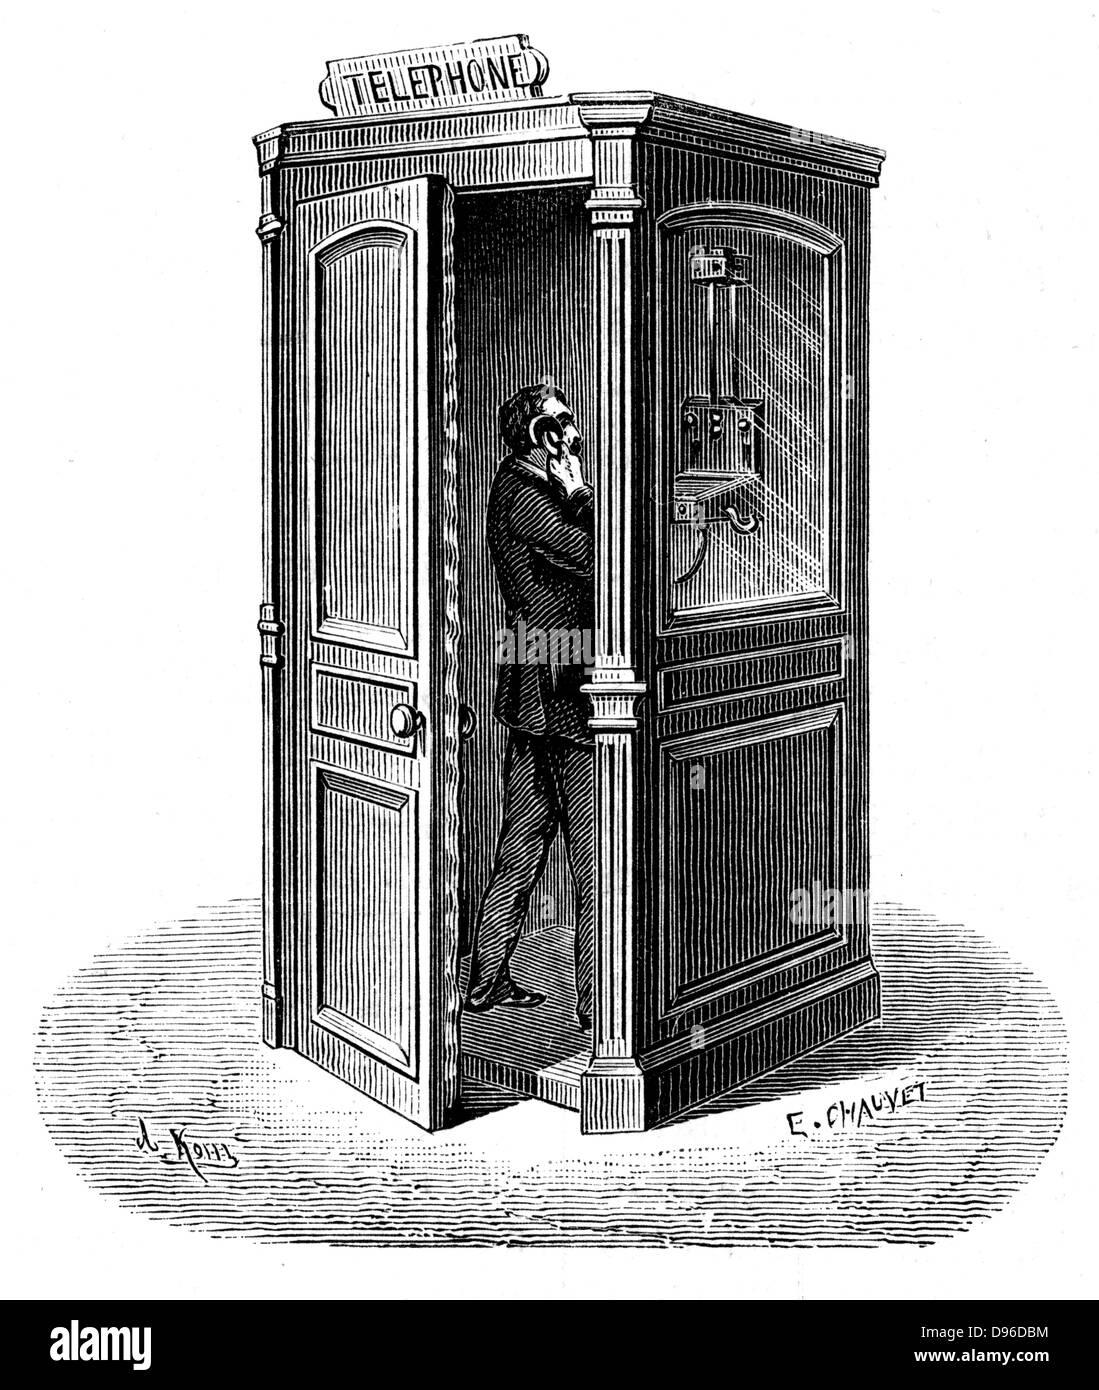 Telephone call box. Engraving published Paris 1888 - Stock Image